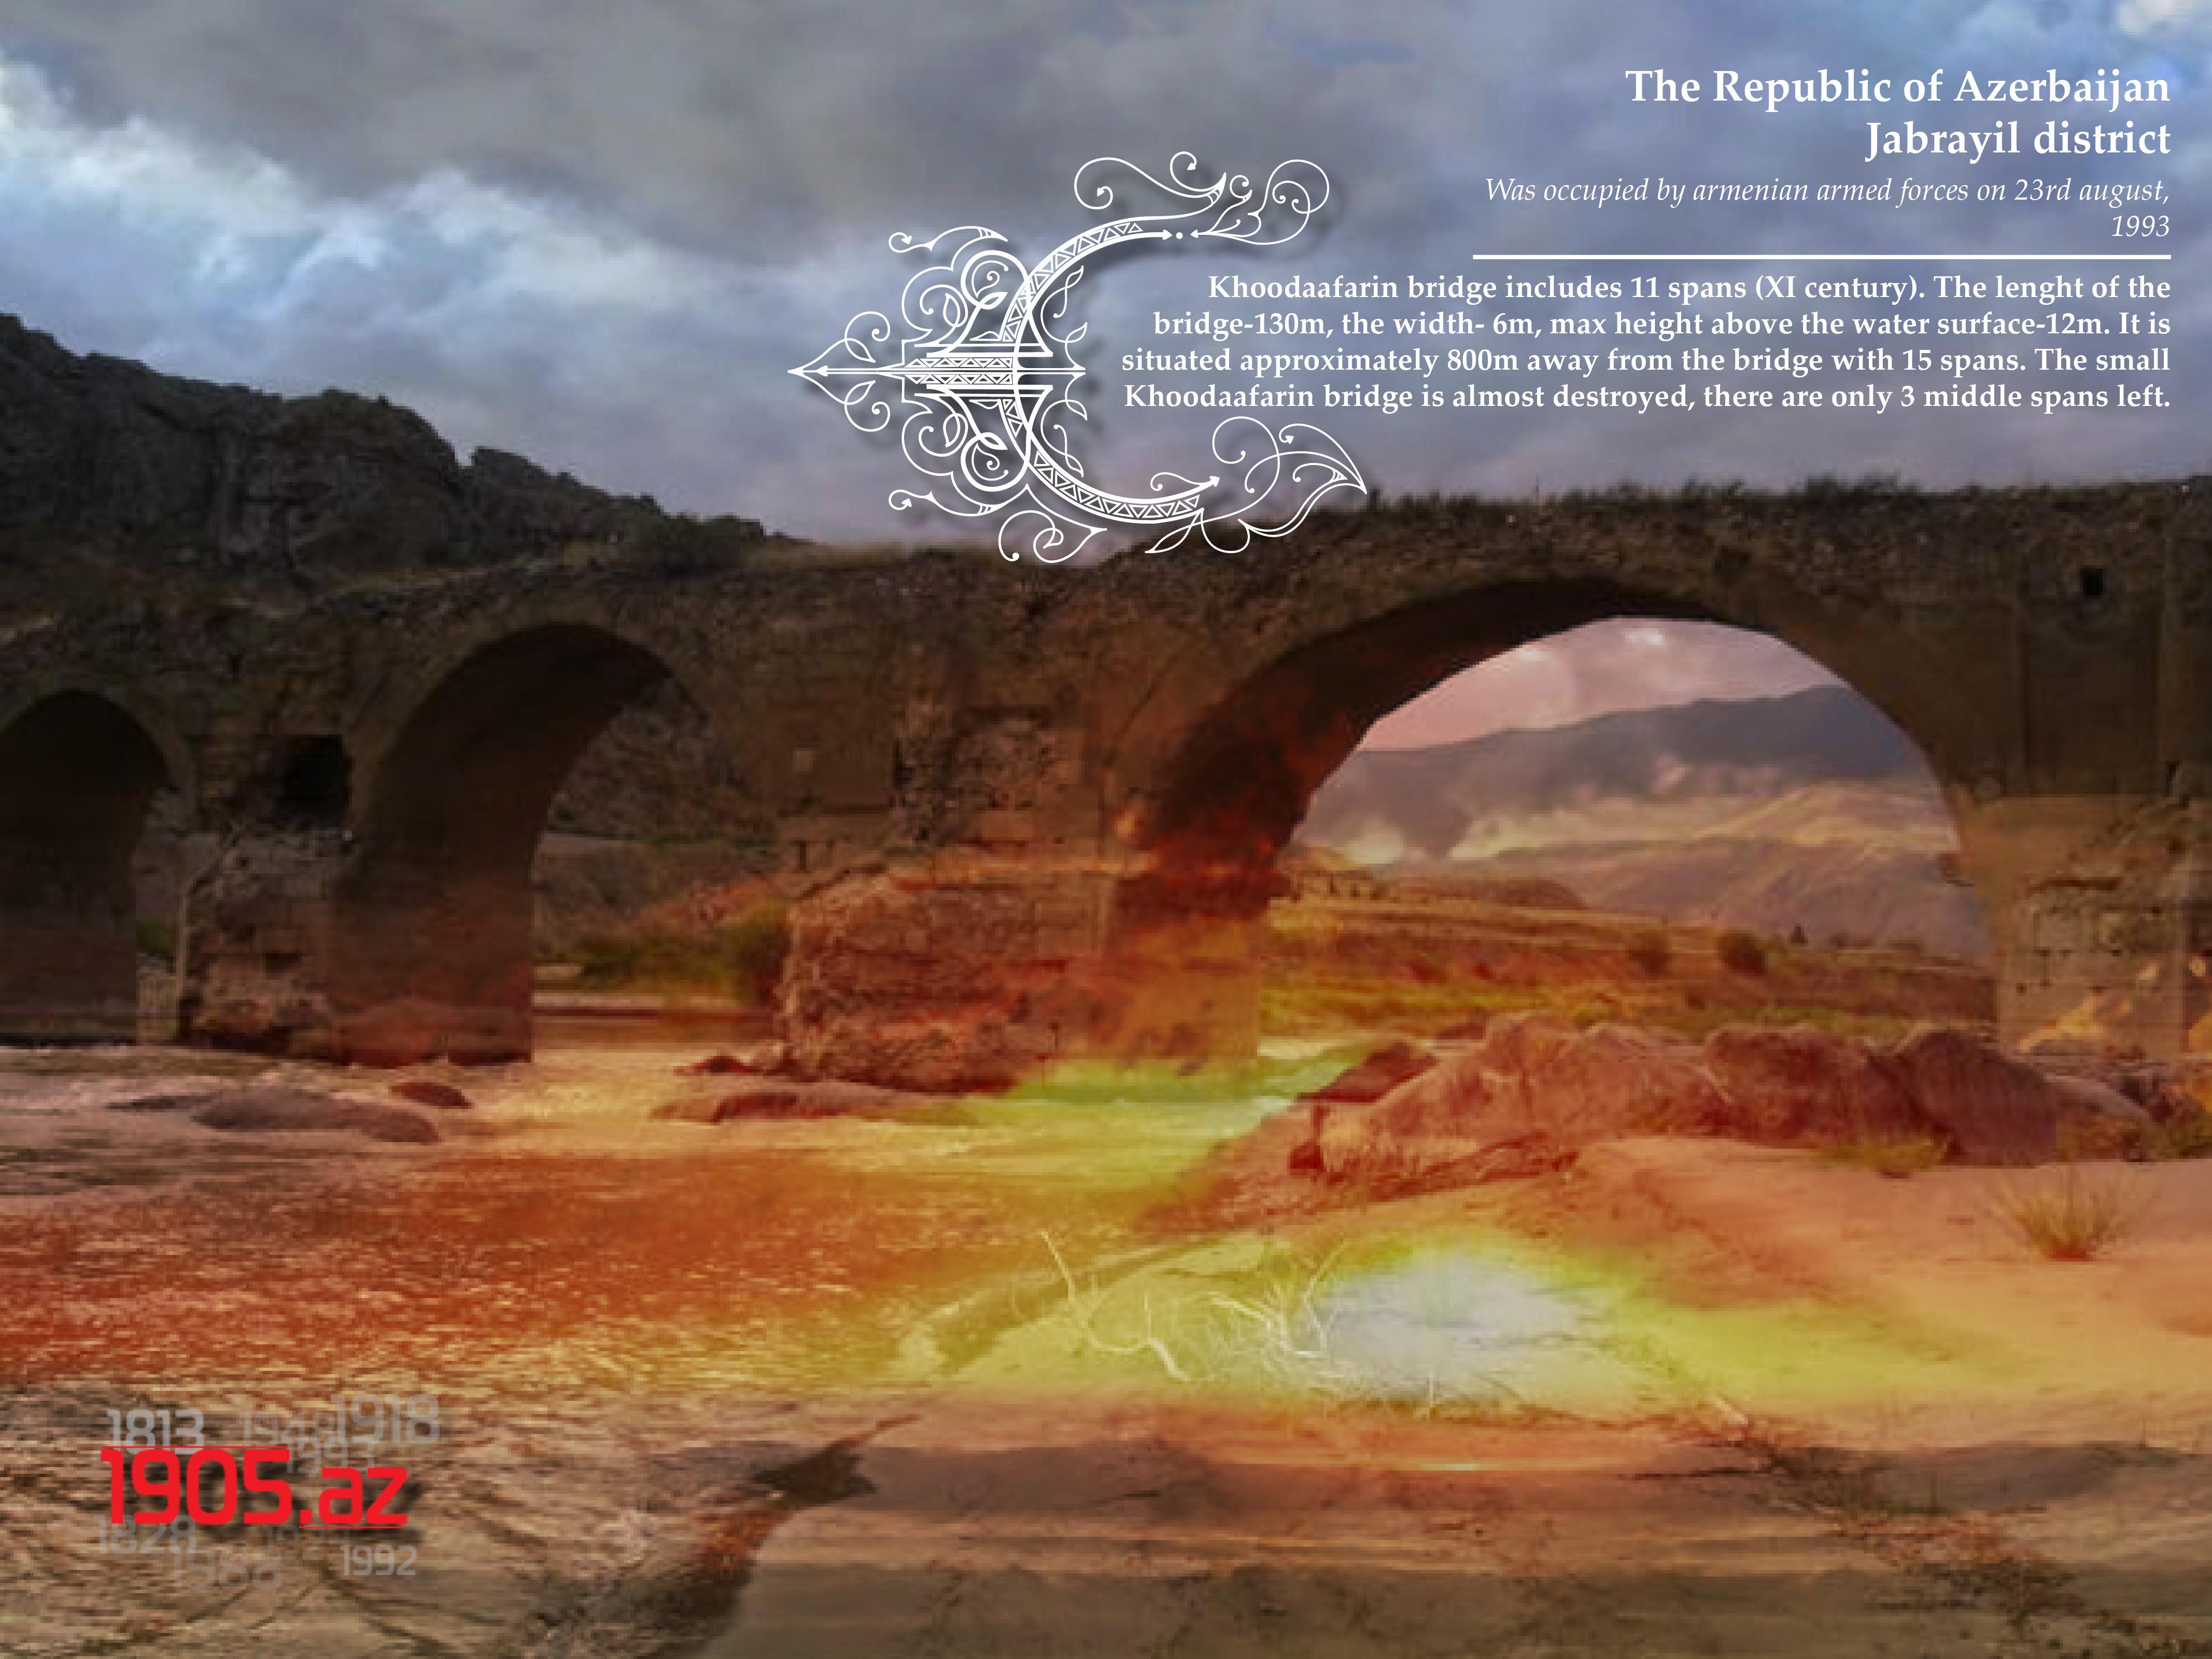 eng_Khoodaafarin bridge with 11 spans_Jabrayil district